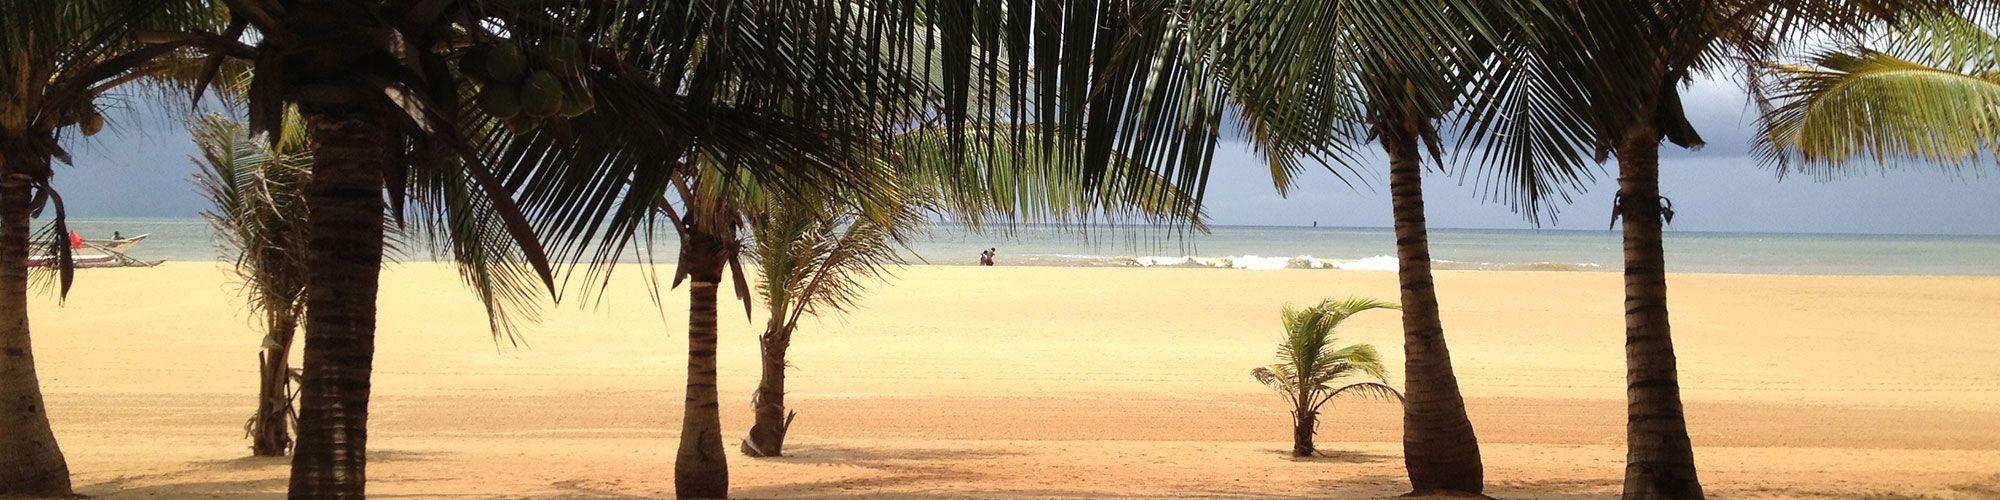 Sri Lanka, Negombo, Strand